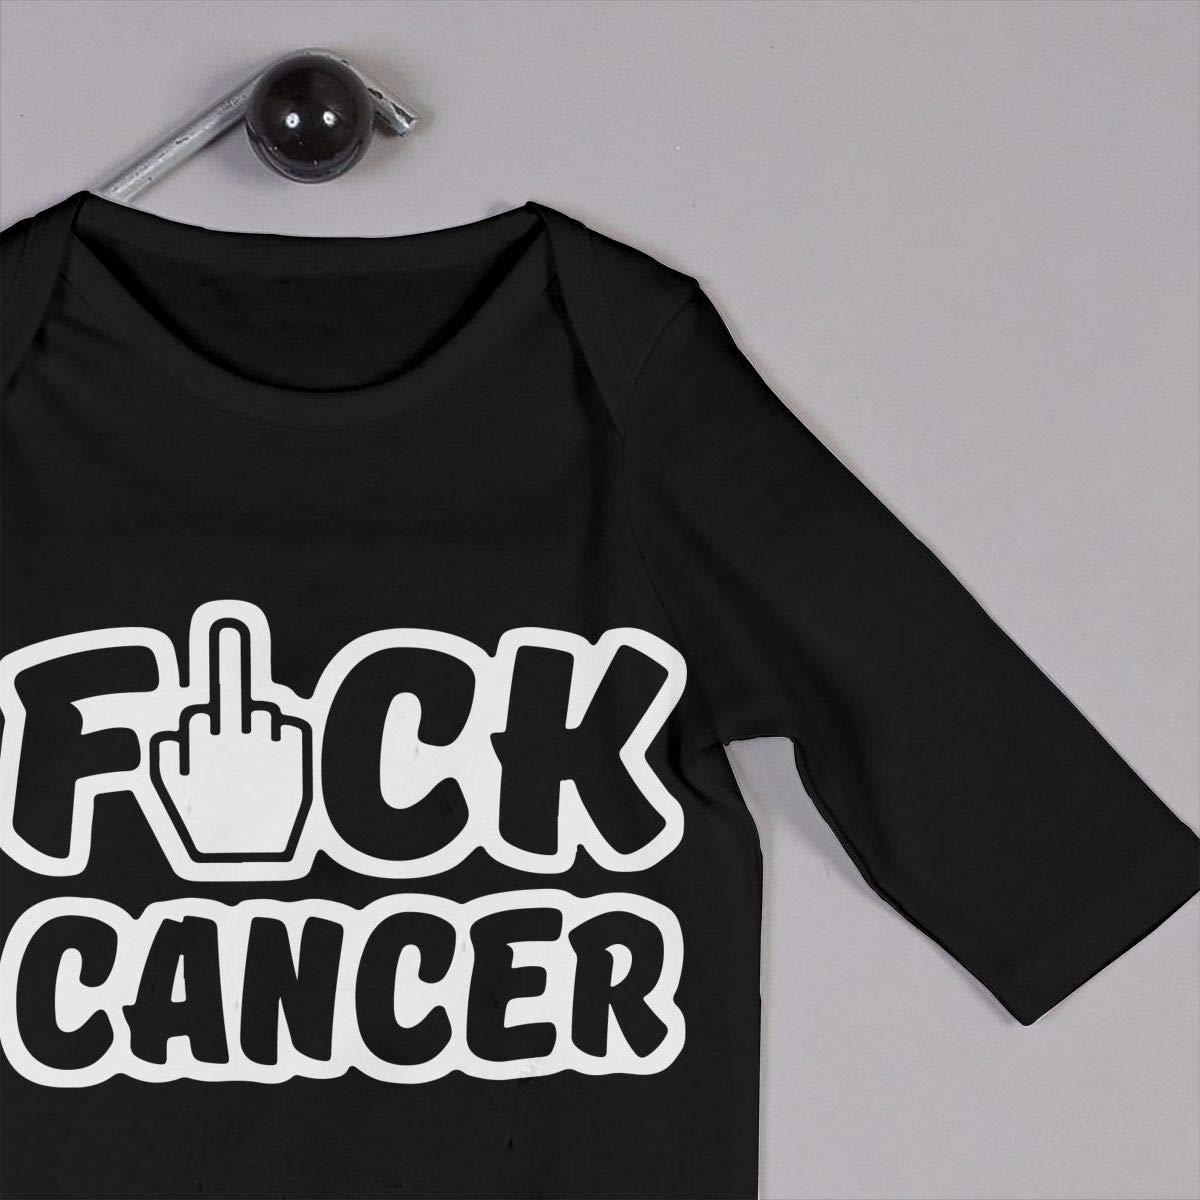 Fashion Fuck Cancer 1 Playsuit U99oi-9 Long Sleeve Cotton Bodysuit for Unisex Baby